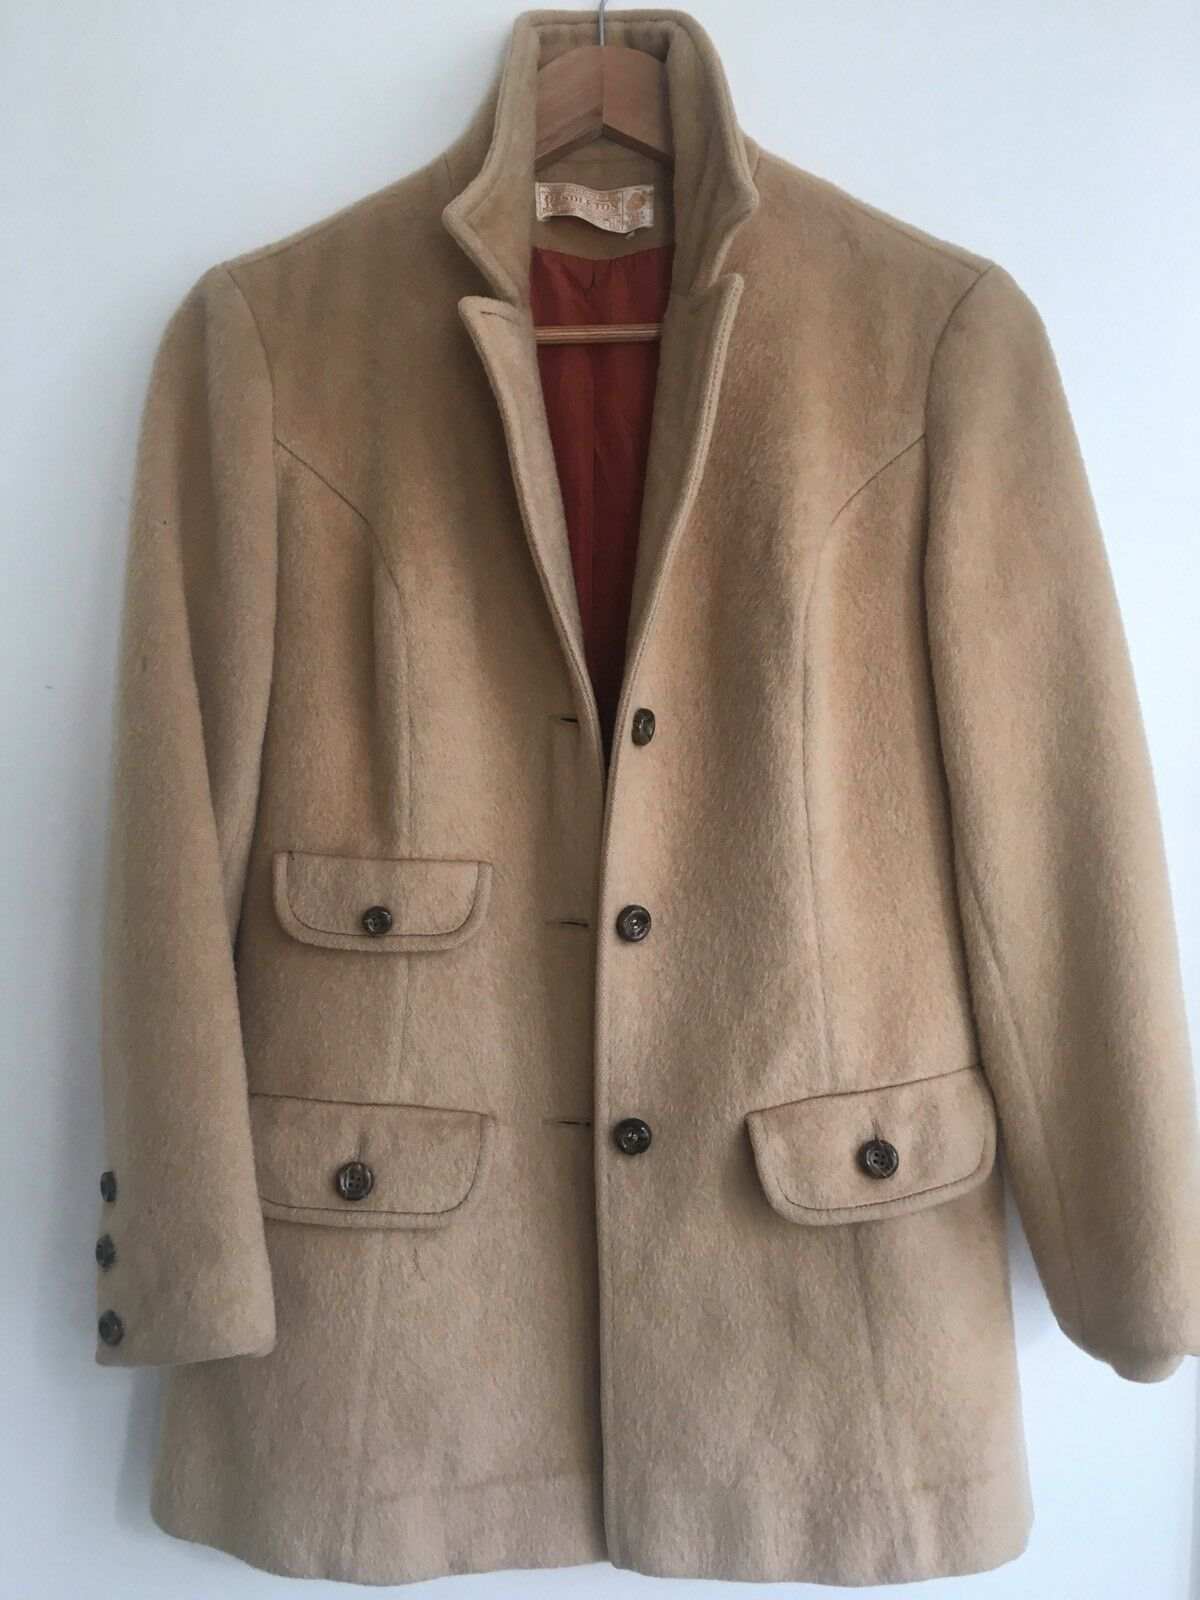 Amazing Vintage Pendleton Womens Beige 100% Pure Virgin Wool Button up Warm Coat